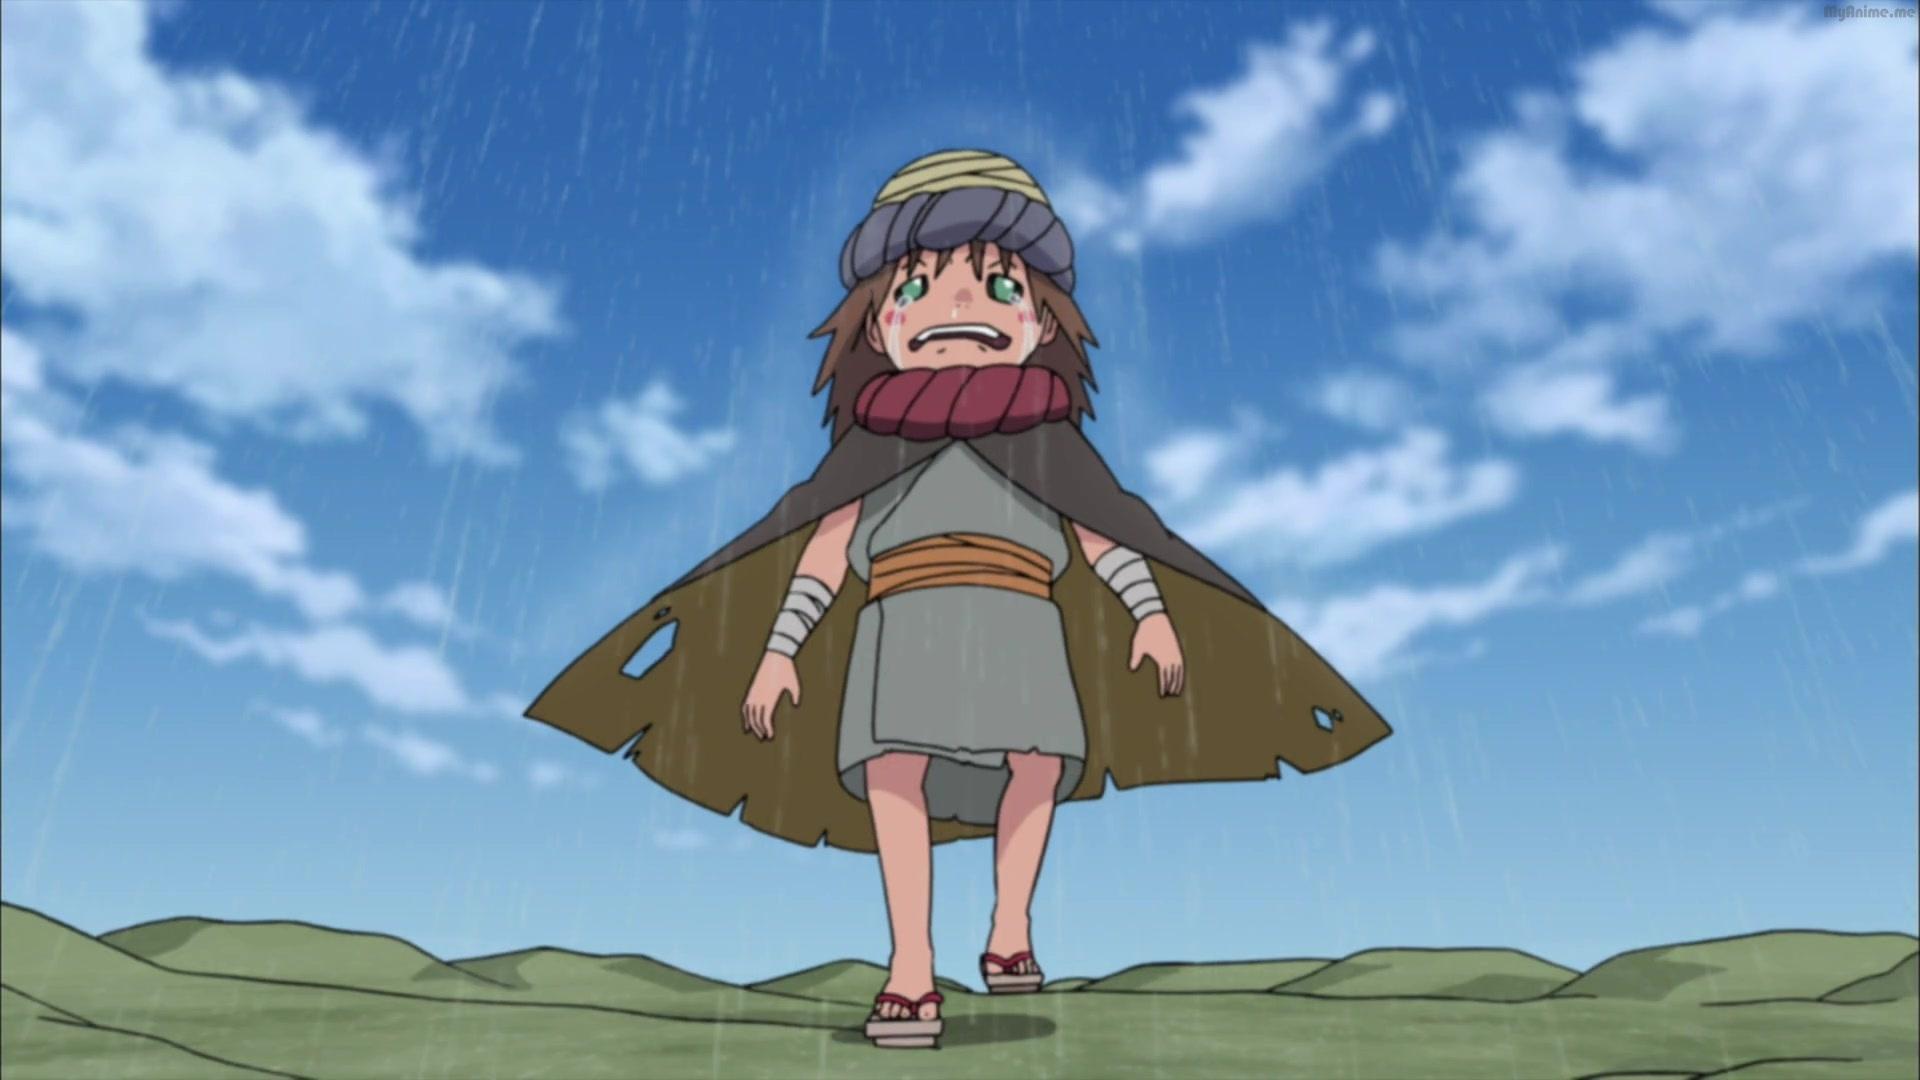 naruto shippuden episode 205 narutonine english dubbed